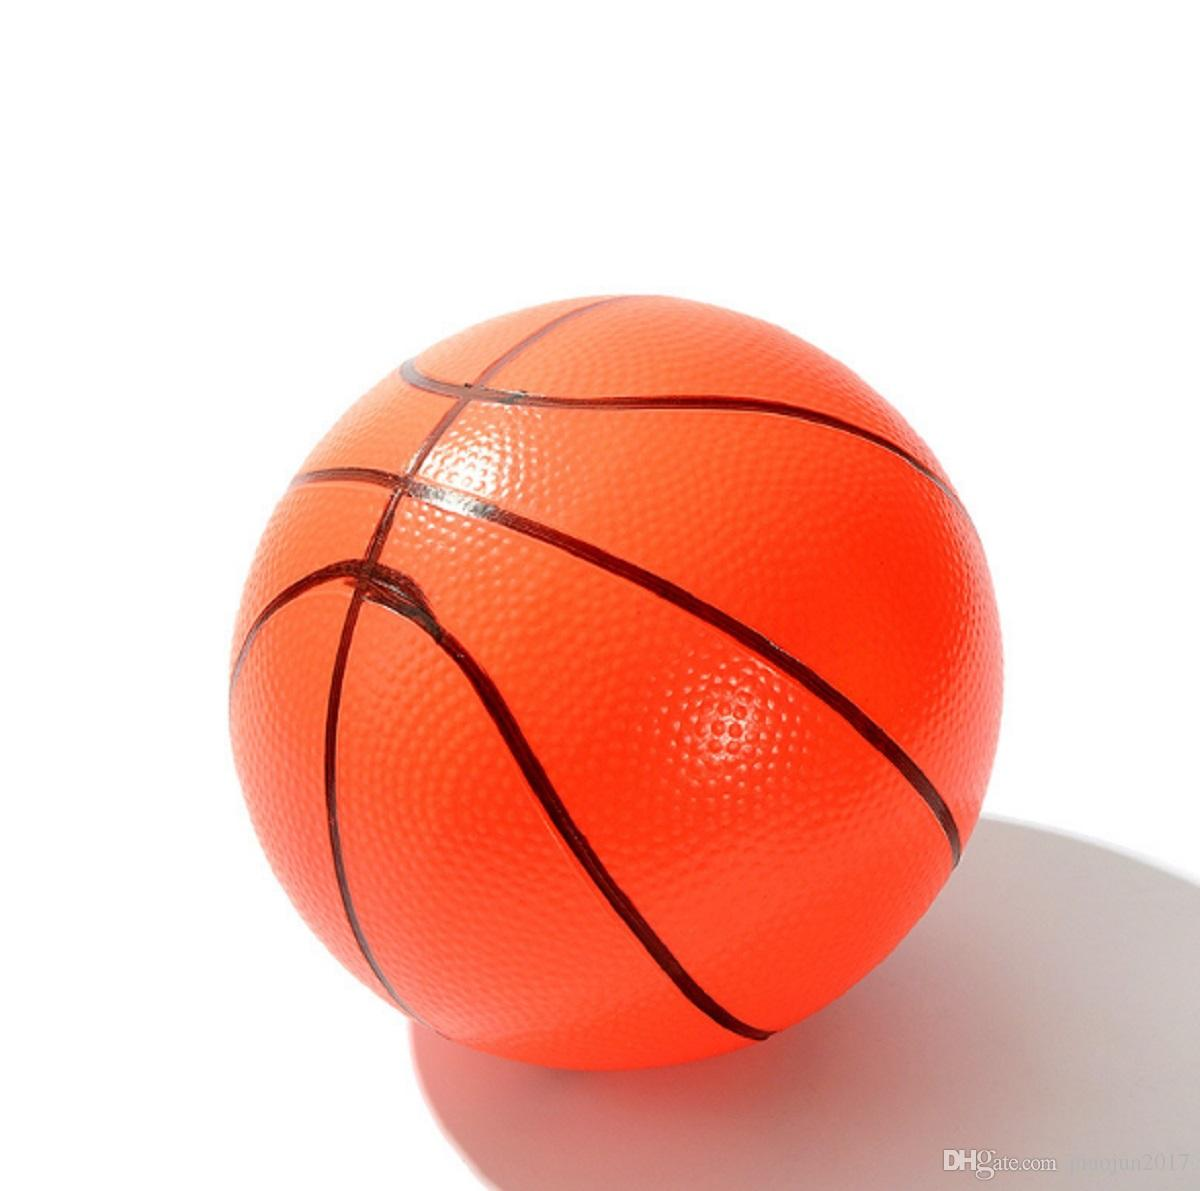 Compre Mini Pelota De Juego Para Niños De Baloncesto. Pelota De Rebote De  Juguetes Para Bebés Para Uso En Piscinas Al Aire Libre. 7257b0752de6d